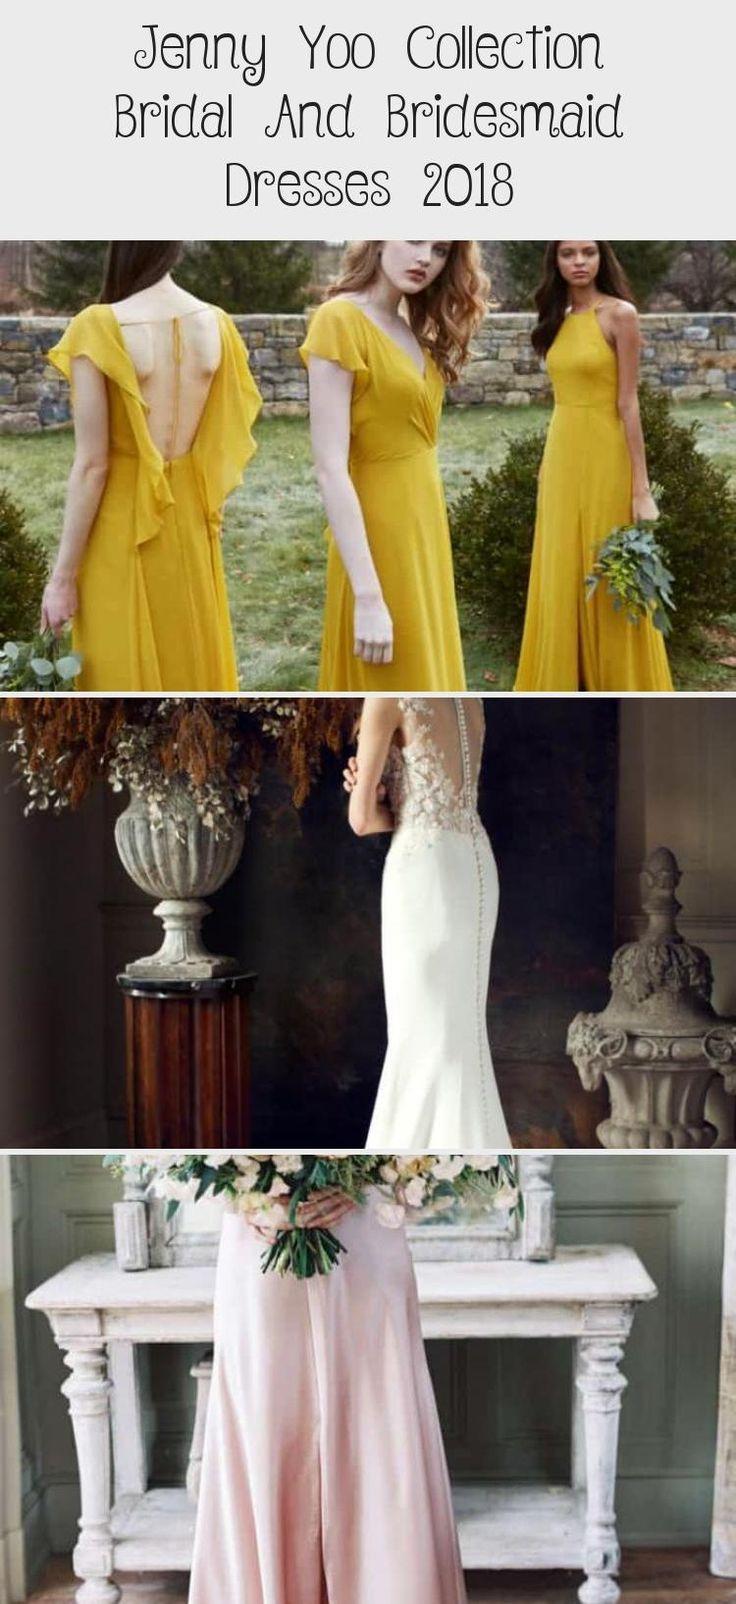 Emerald green satin Jenny Yoo bridesmaid dresses. Winter wedding, dark green bridesmaid dresses, fall wedding, elegant bridesmaids